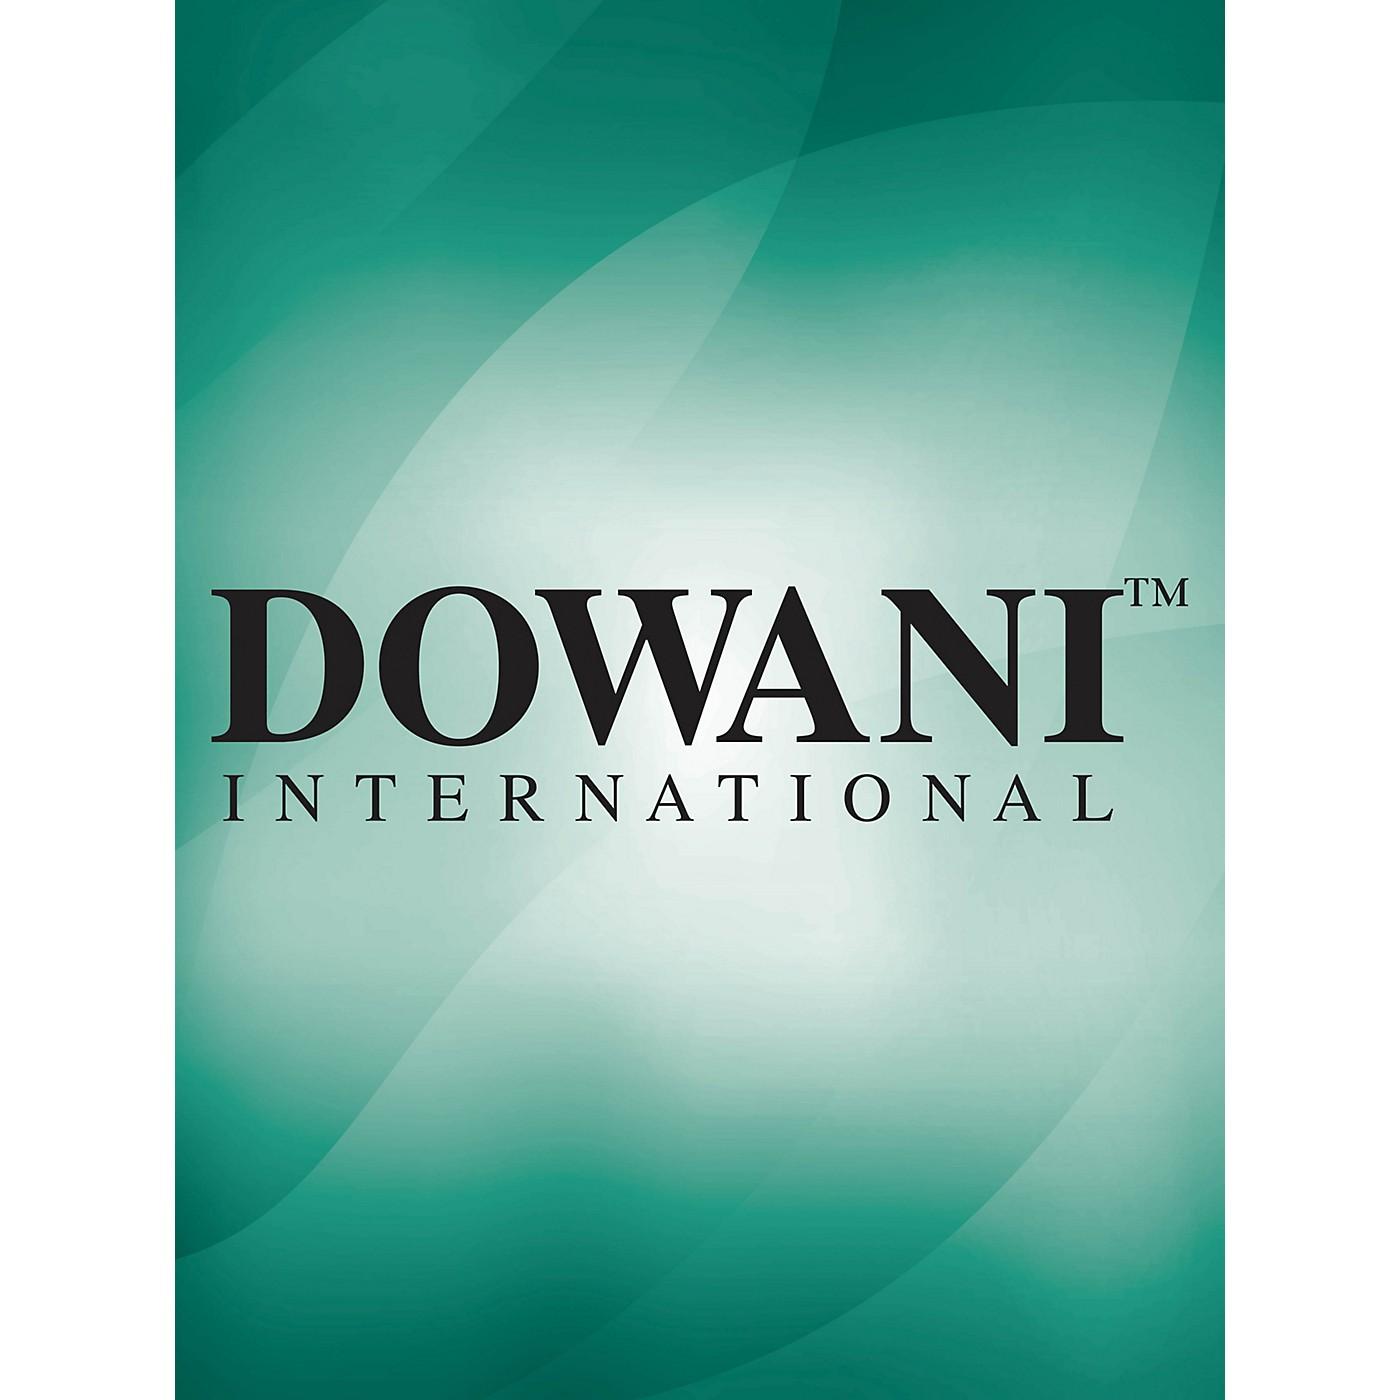 Dowani Editions Paul's Steeple (Trad) & Faronell's Ground (Follia) for Treb (Alto) Recorder and Basso Cont Dowani Book/CD thumbnail